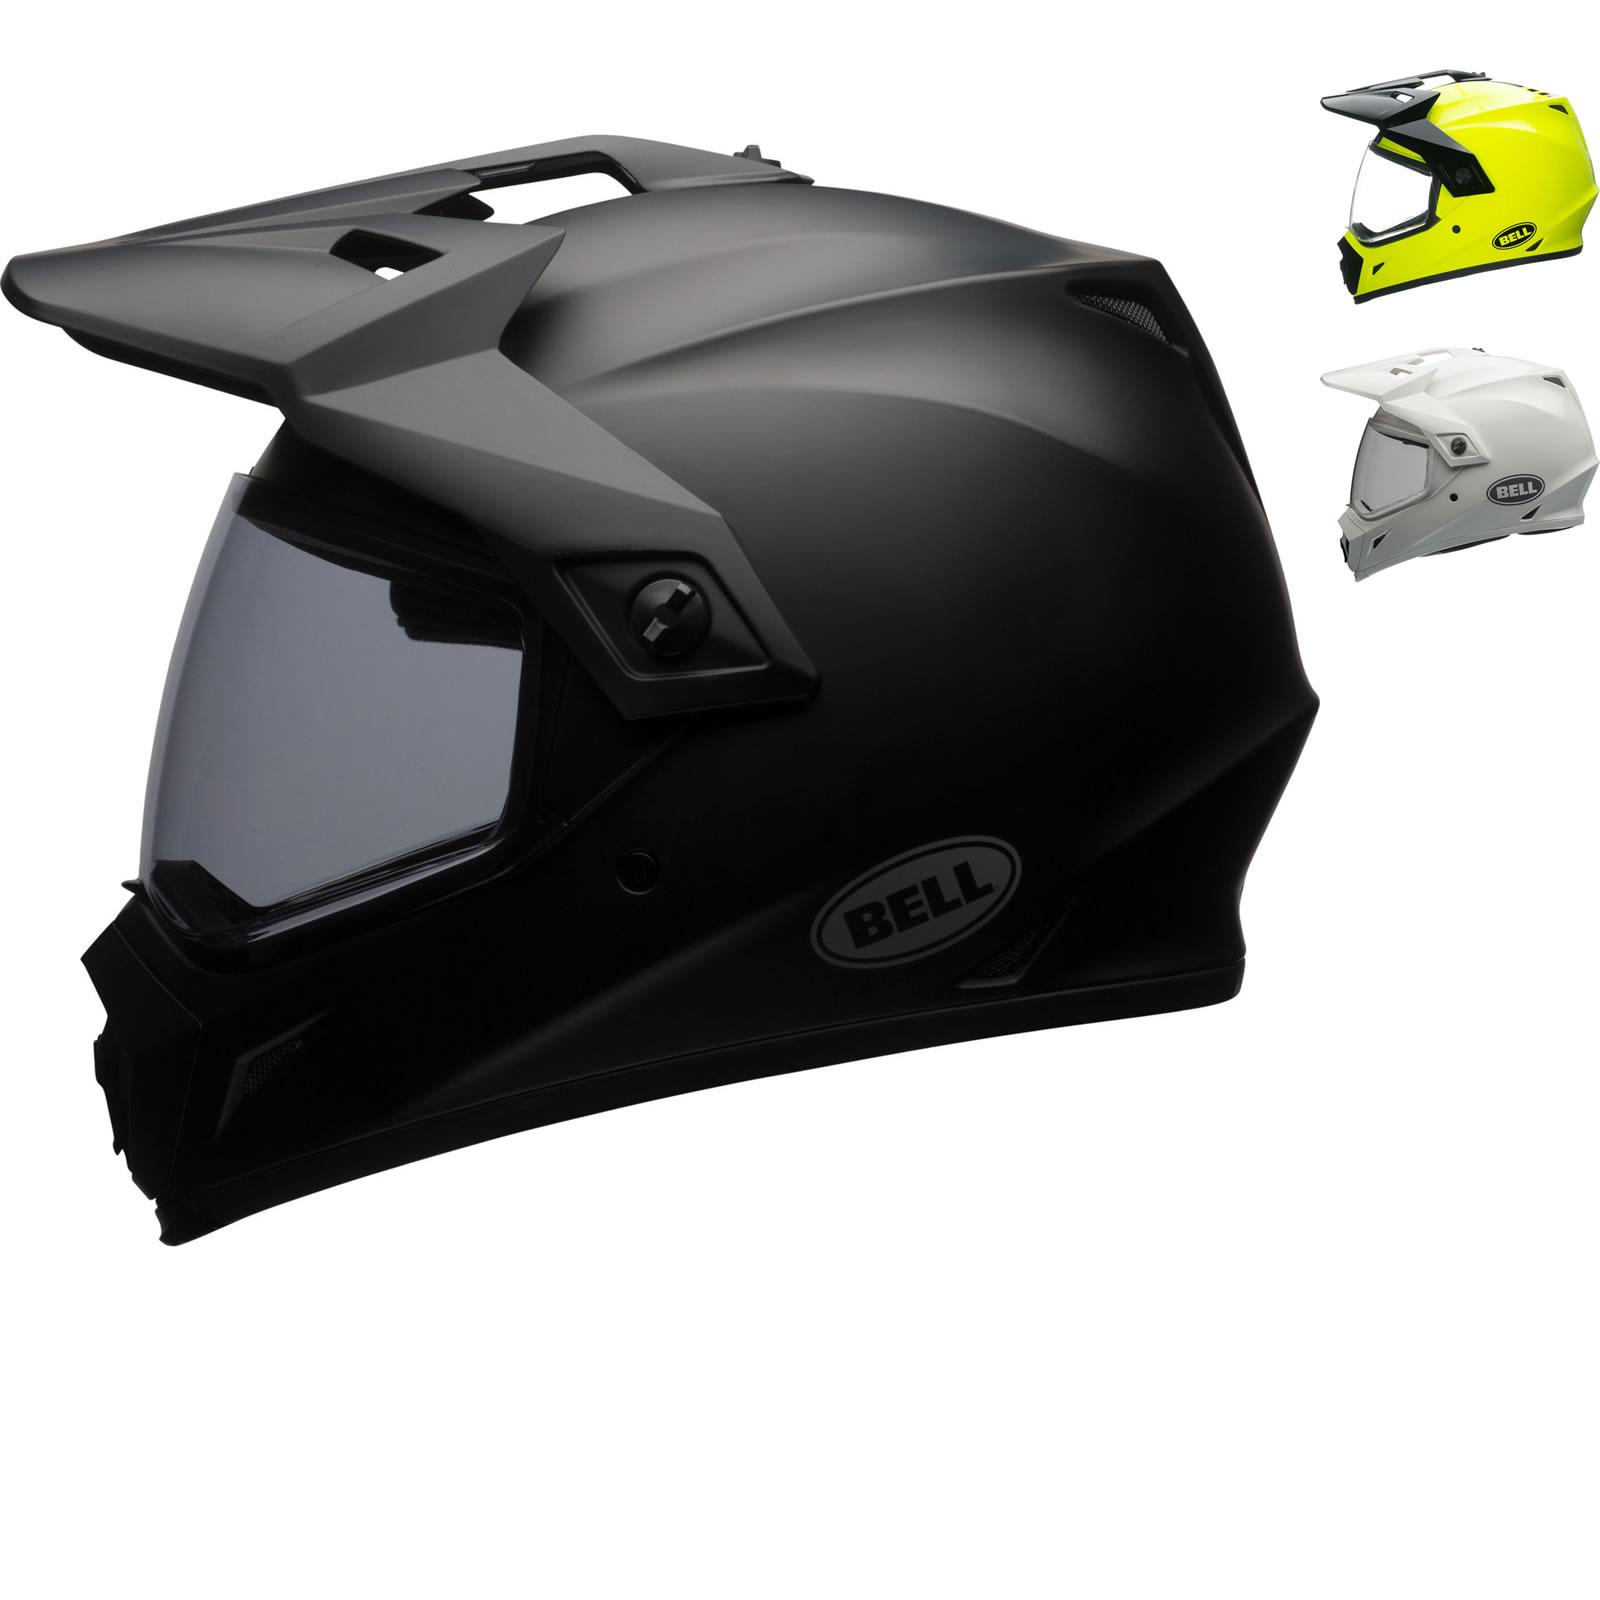 Bell Dual Sport Helmet >> Bell MX-9 Adventure MIPS Solid Dual Sport Helmet - Bell - Ghostbikes.com